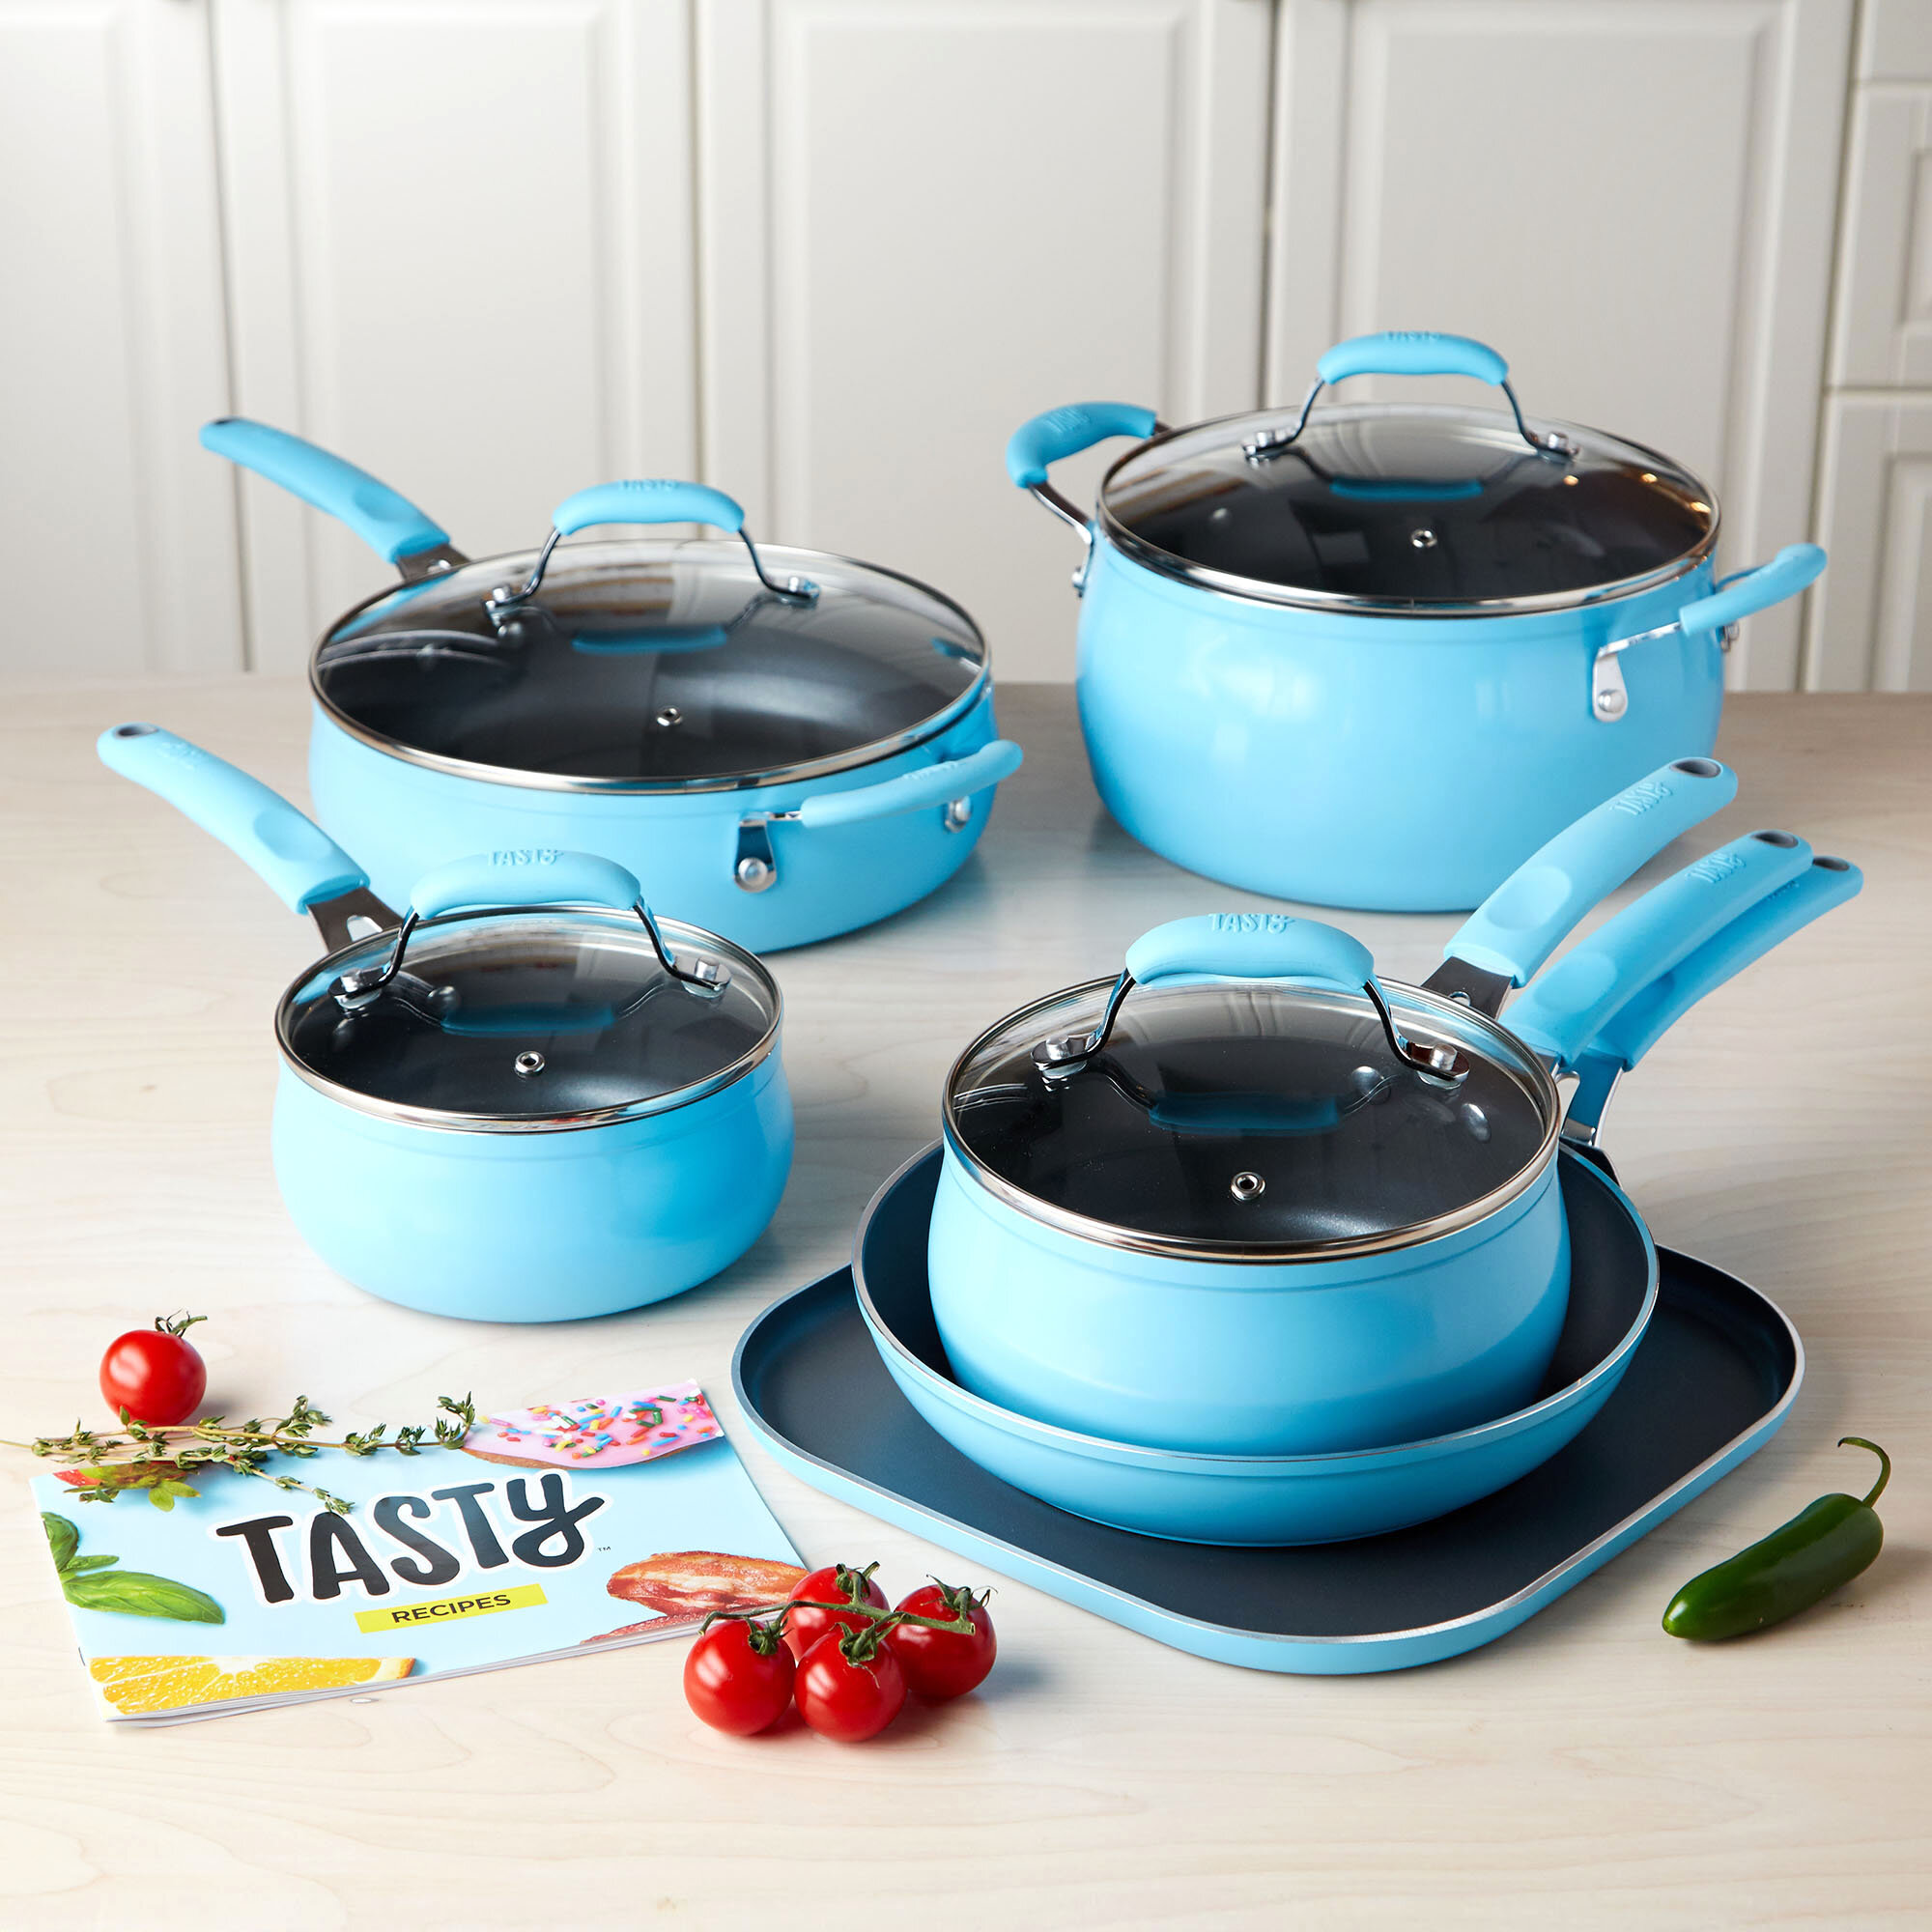 11PC Blue Kitchen set - $79